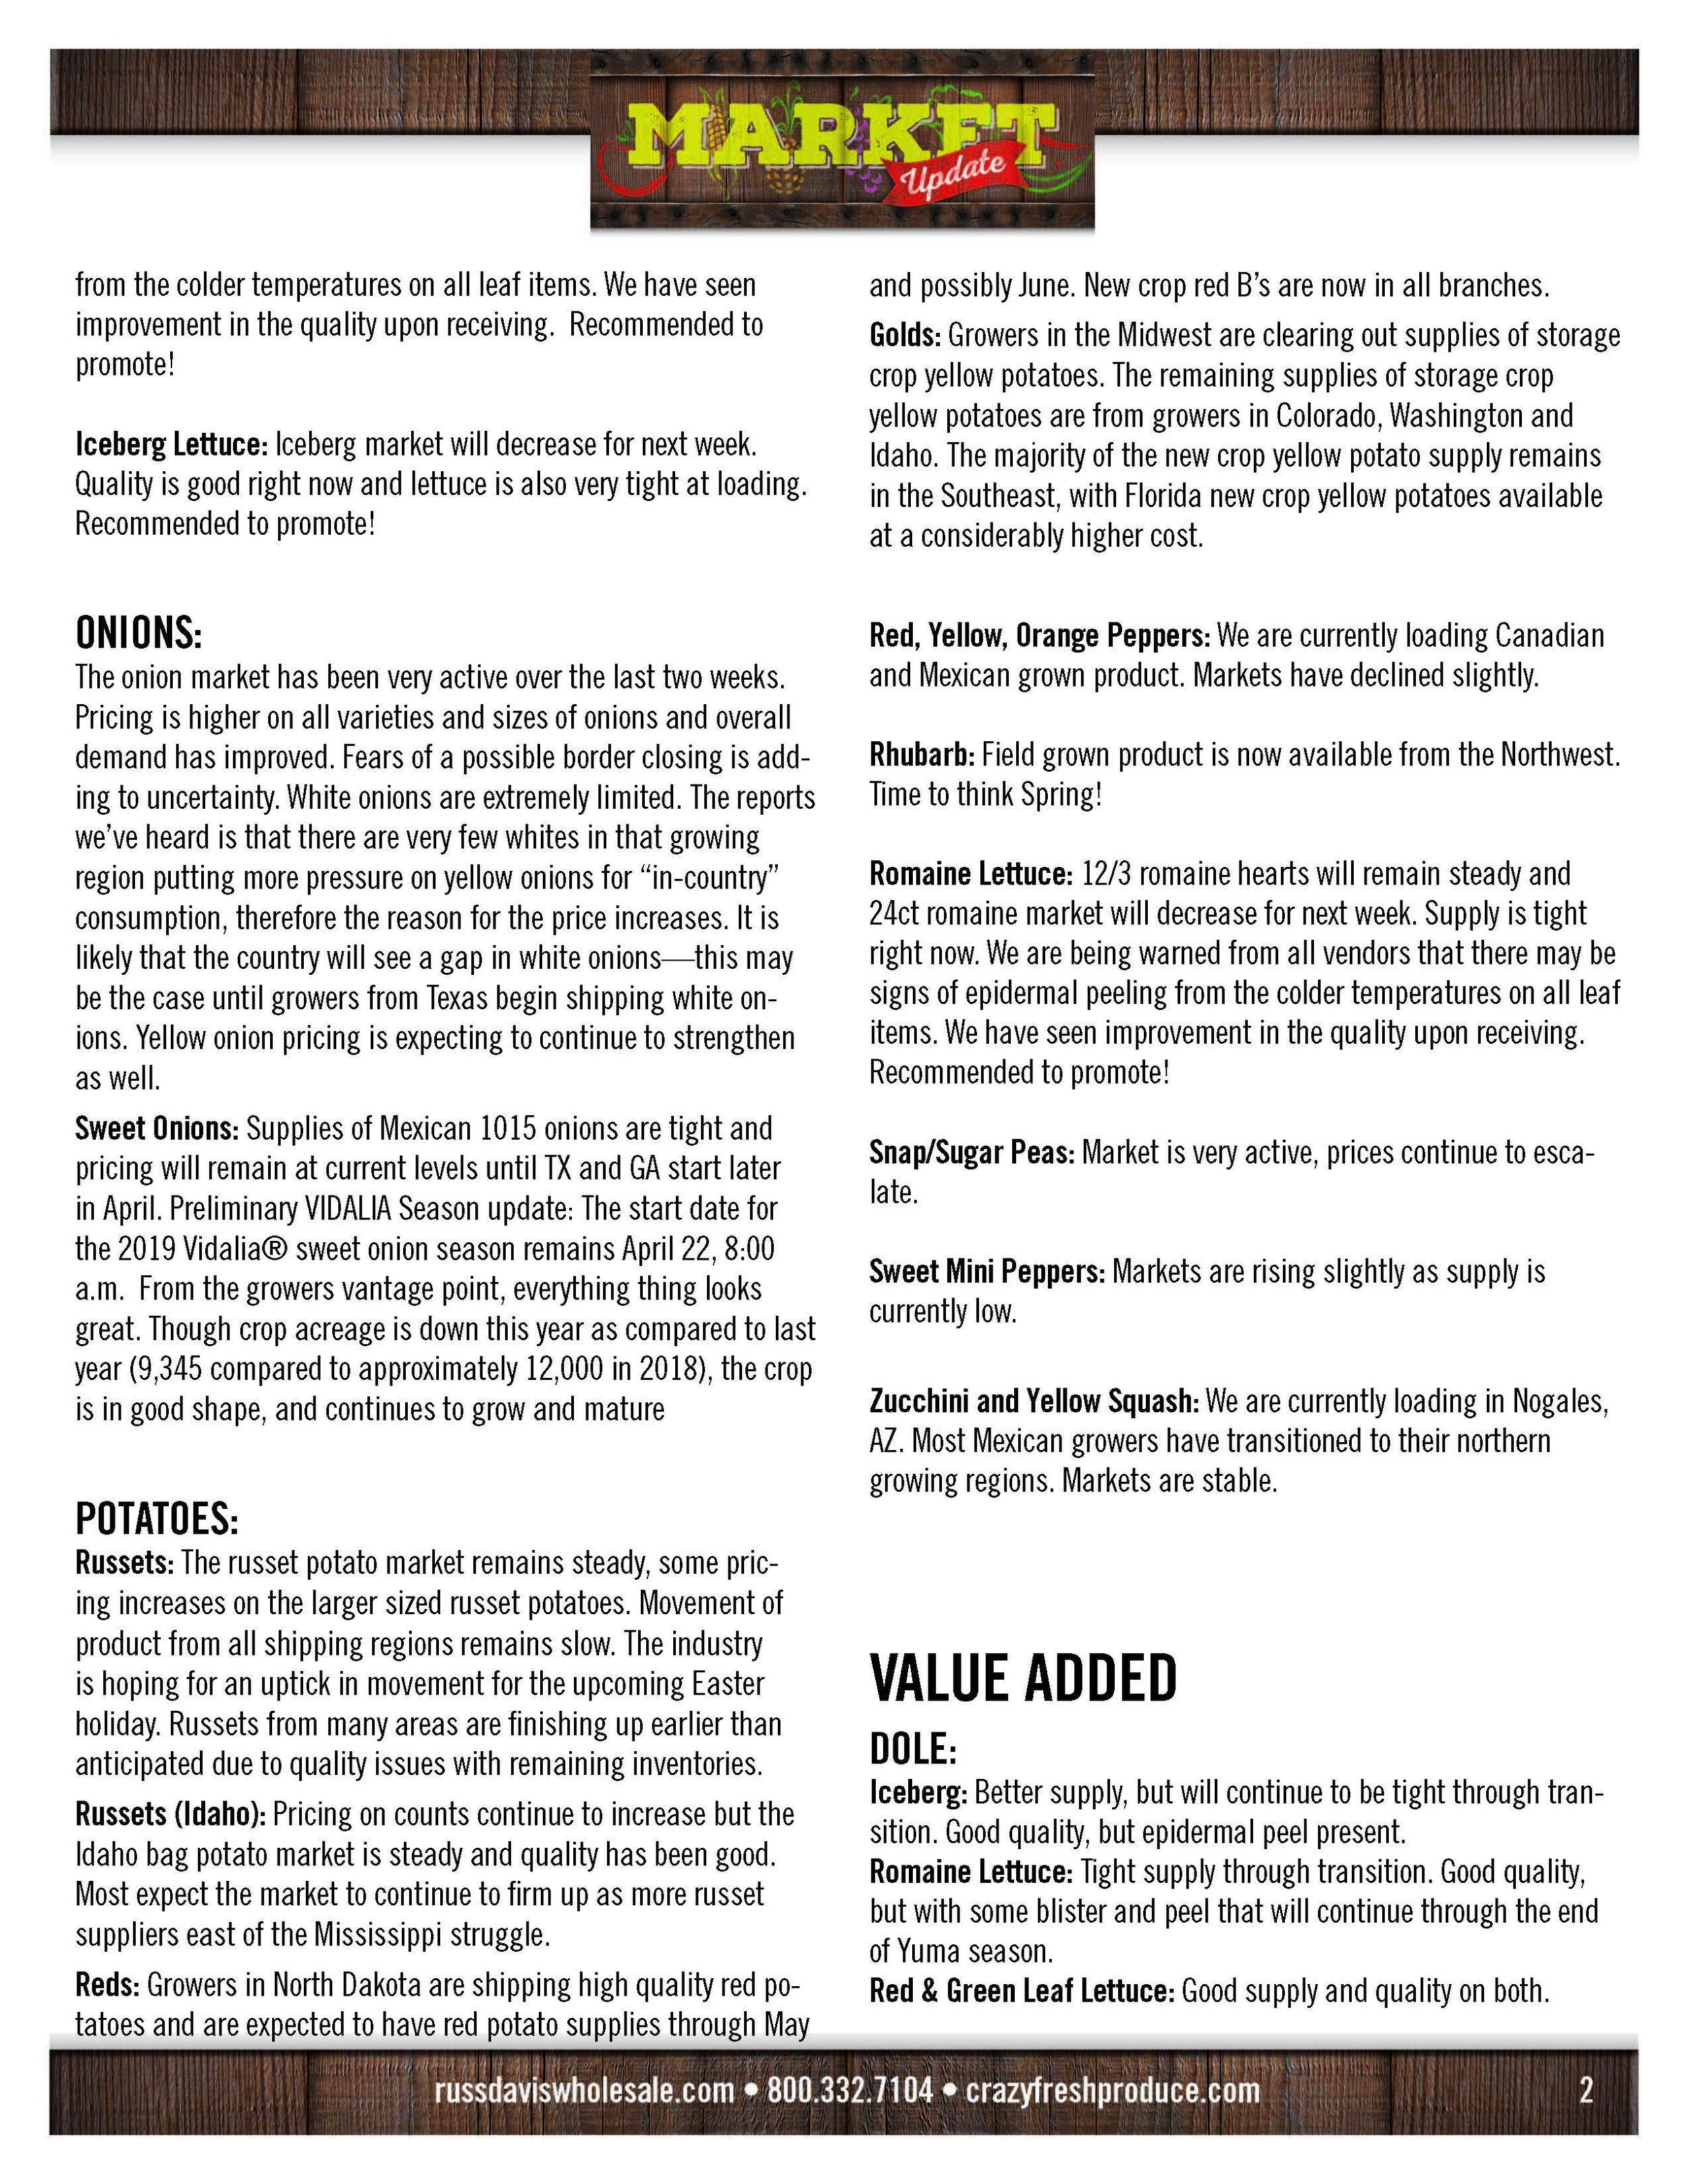 RDW_Market_Update_Apr25_19_Page_2.jpg